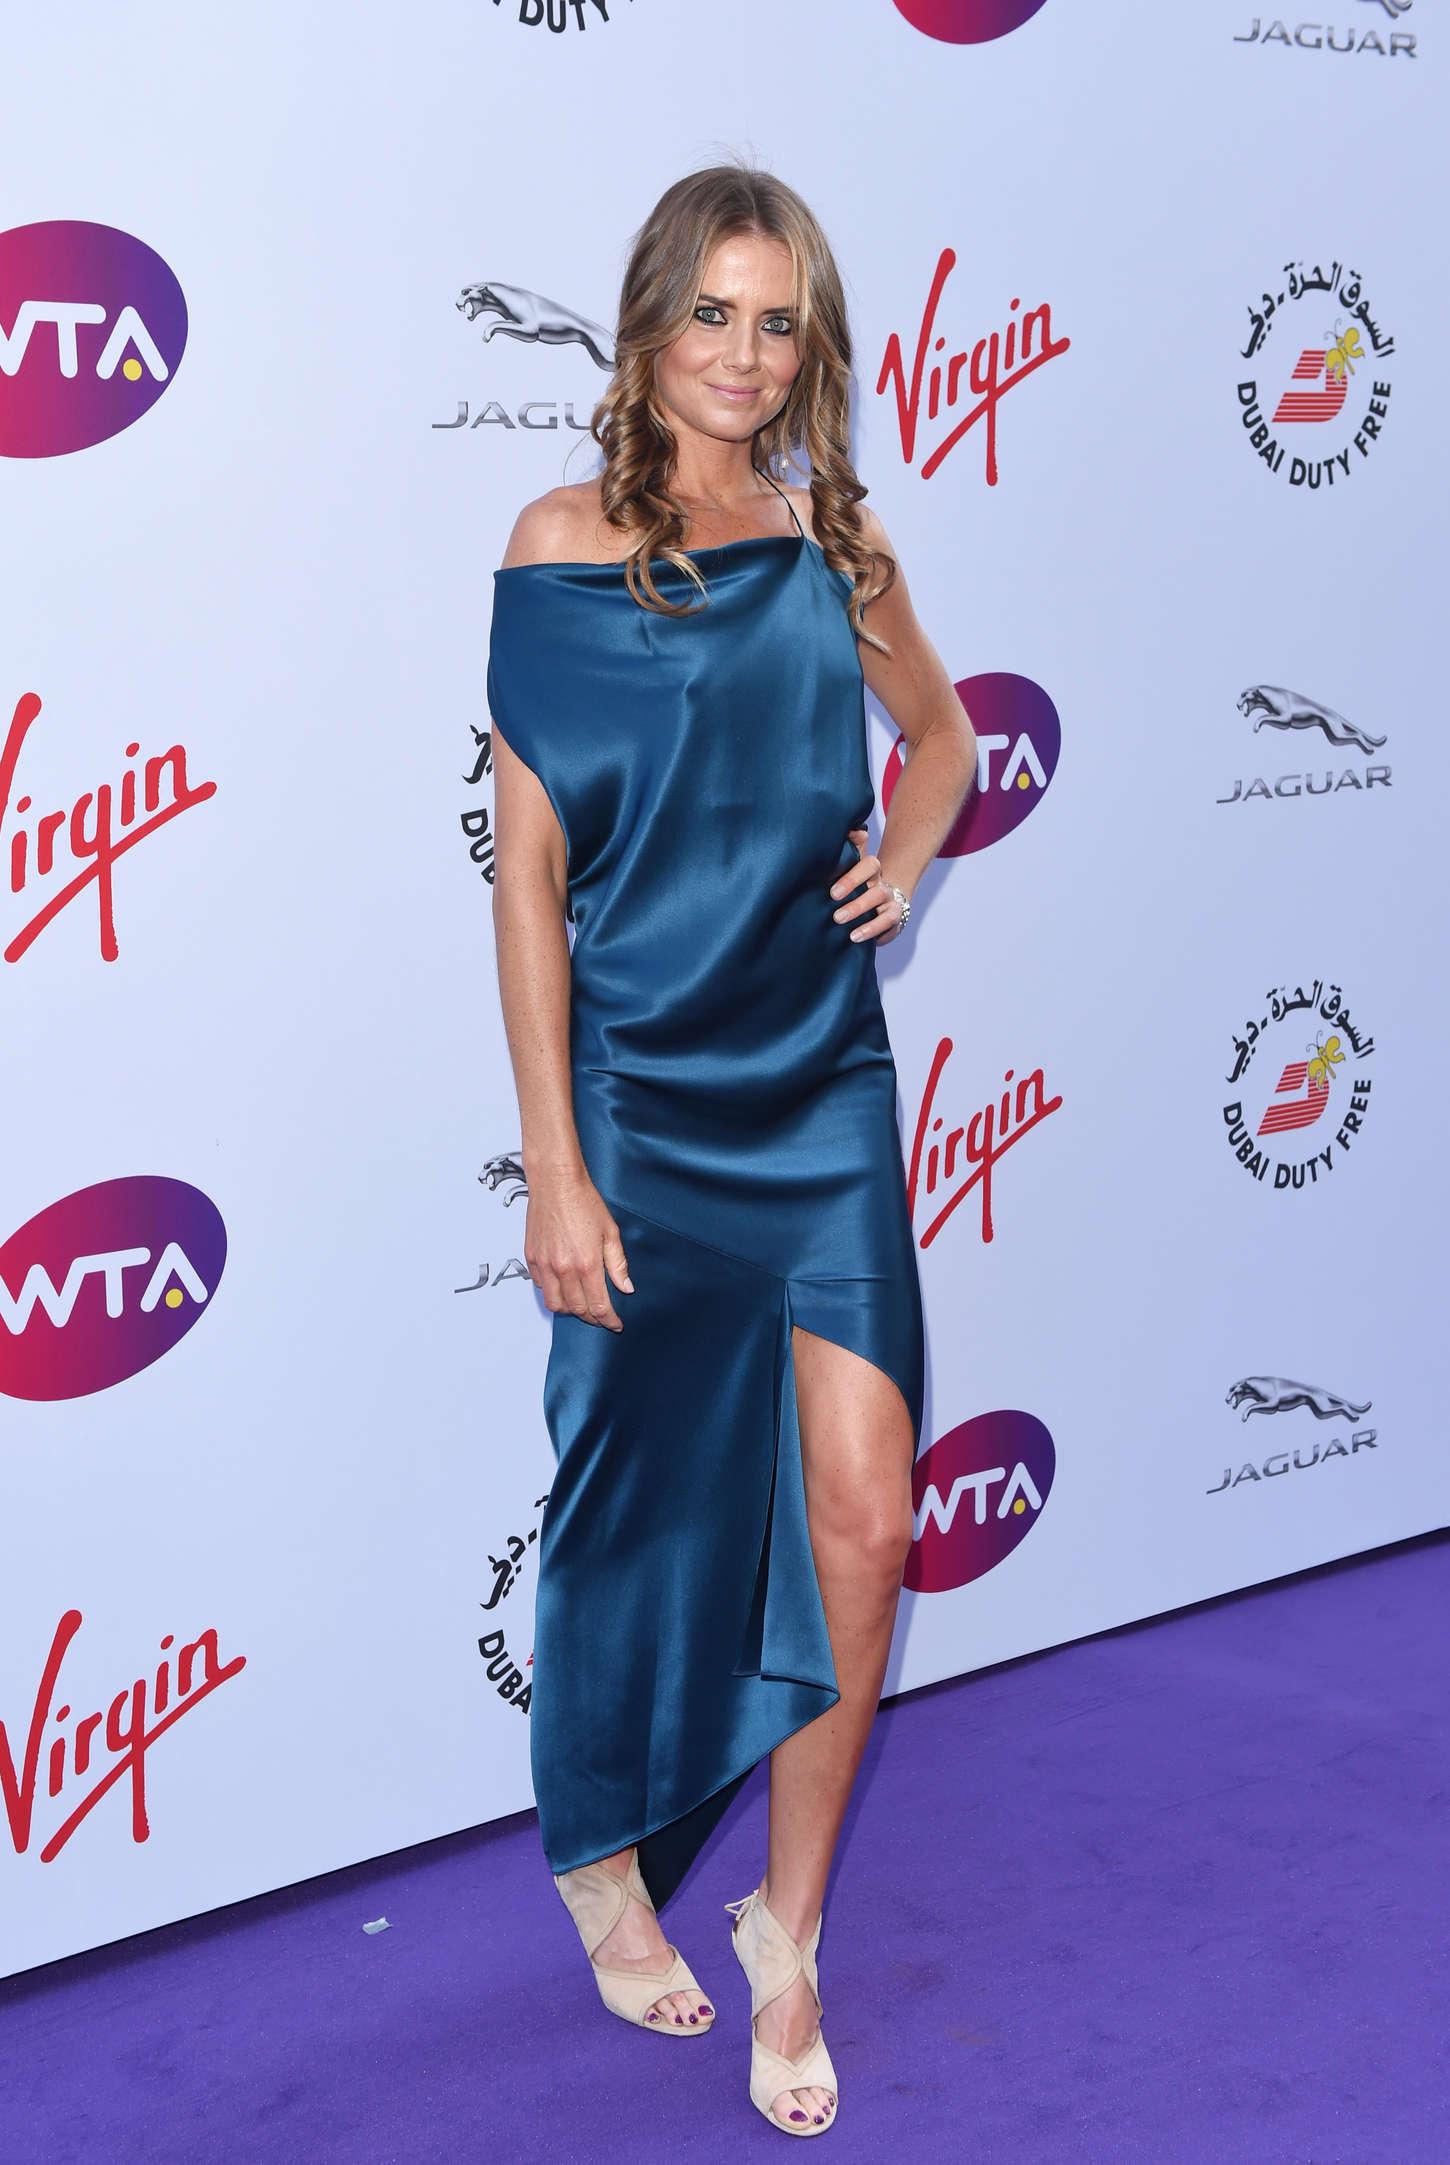 Daniela Hantuchova WTA Pre-Wimbledon Party in London